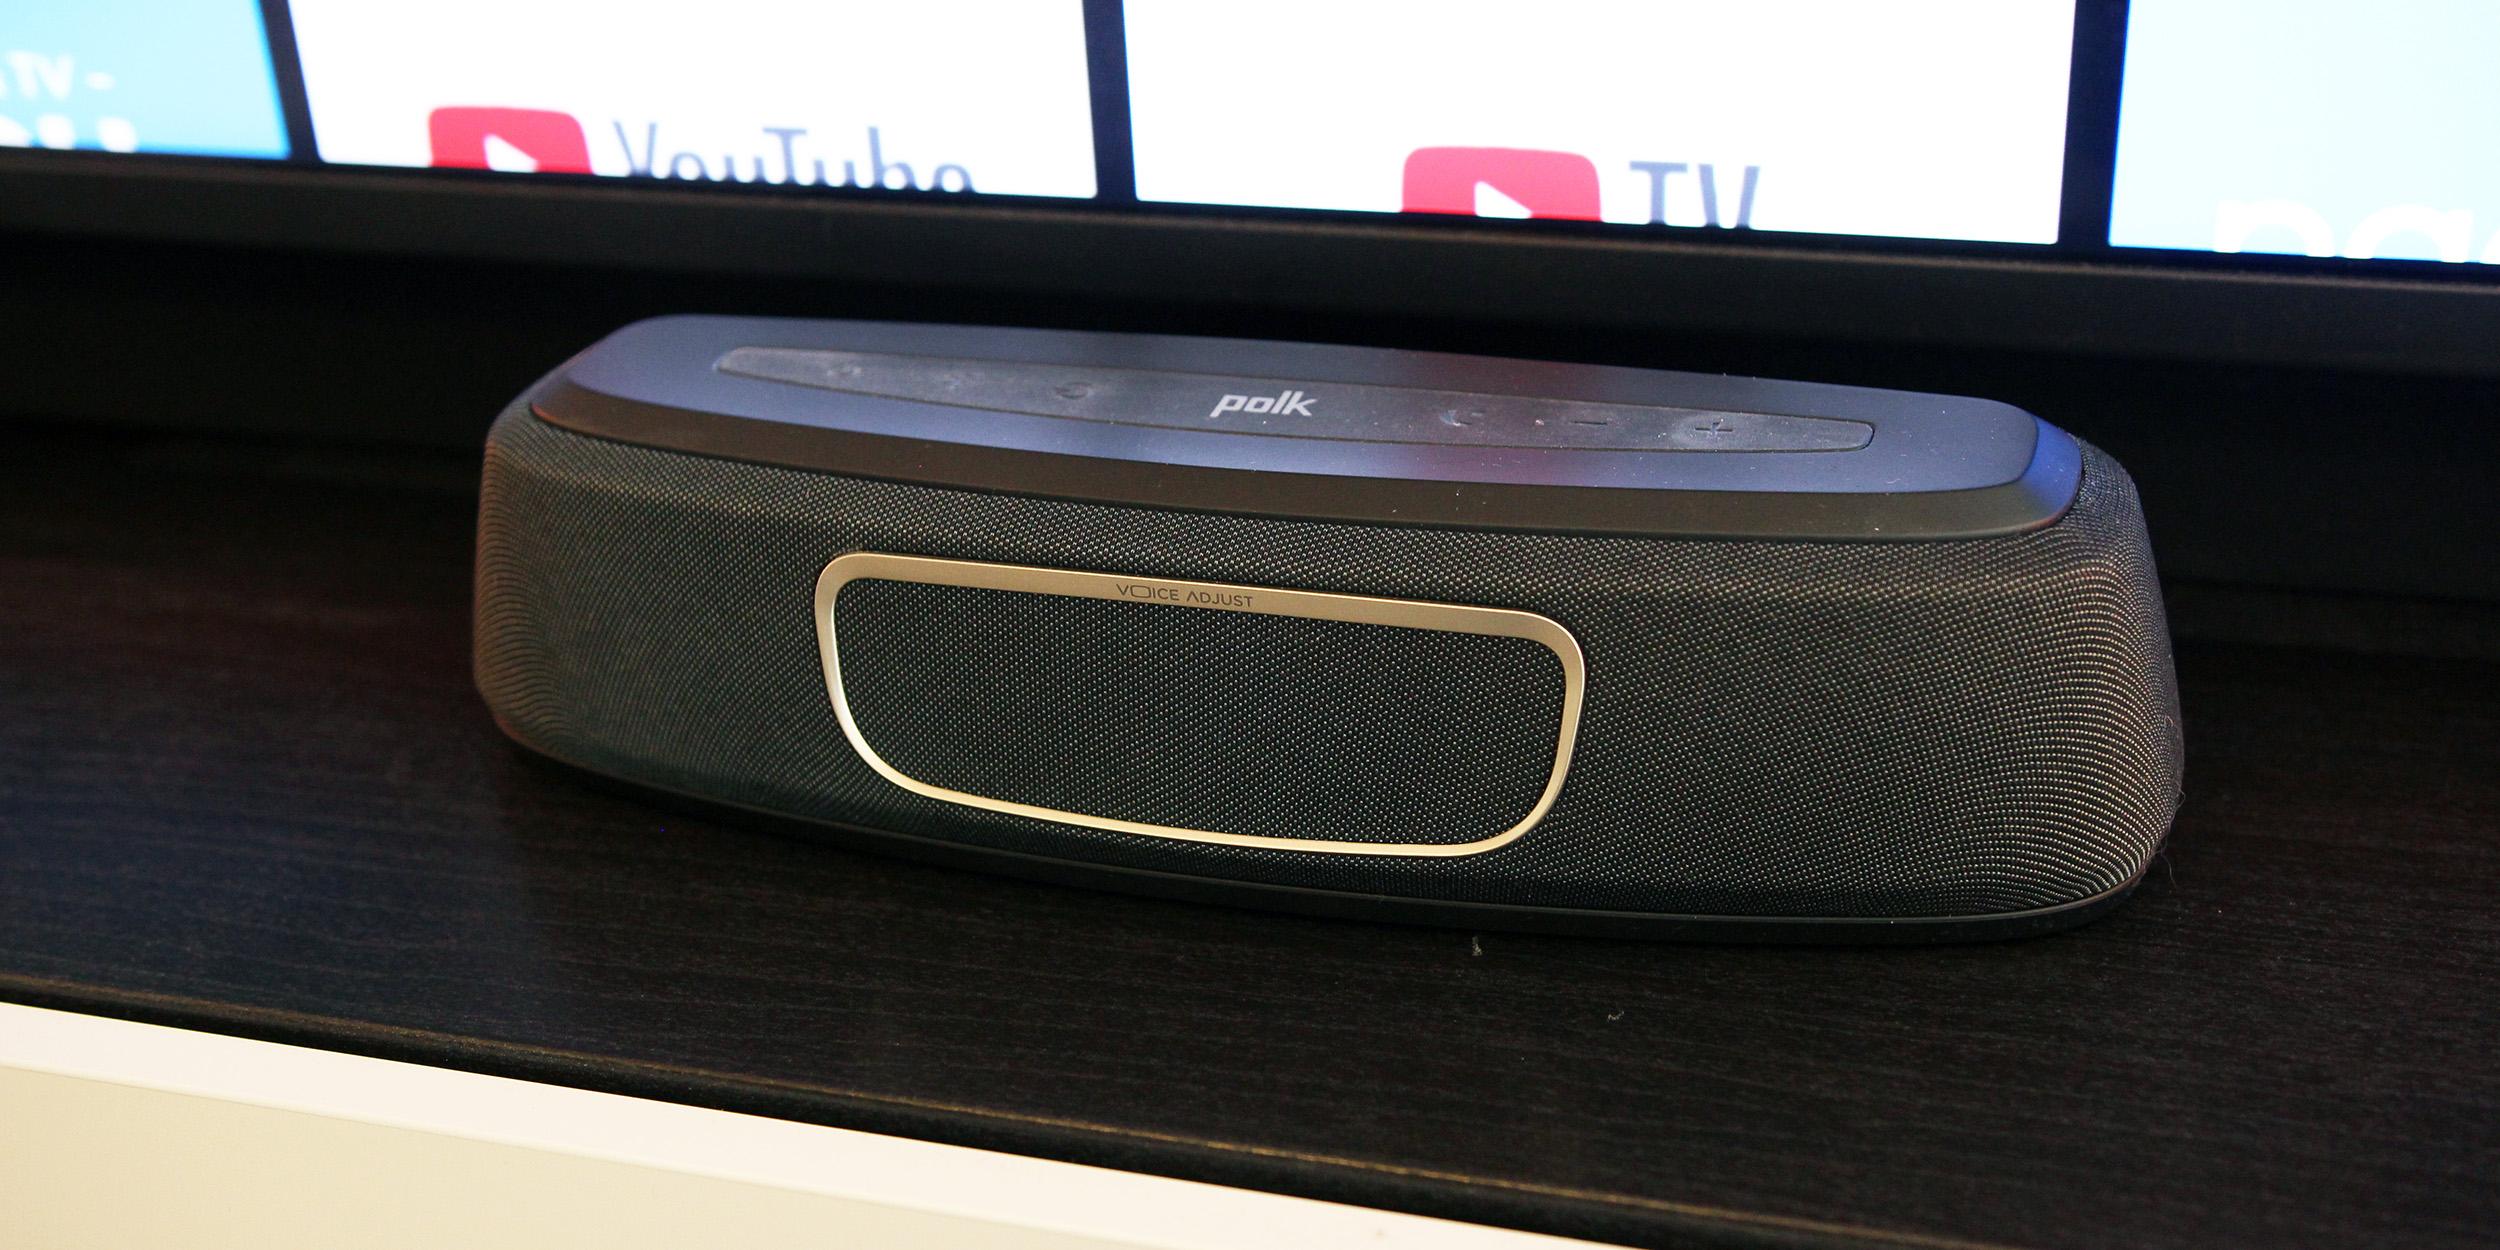 Review: Polk Audio's MagniFi Mini is a Chromecast soundbar